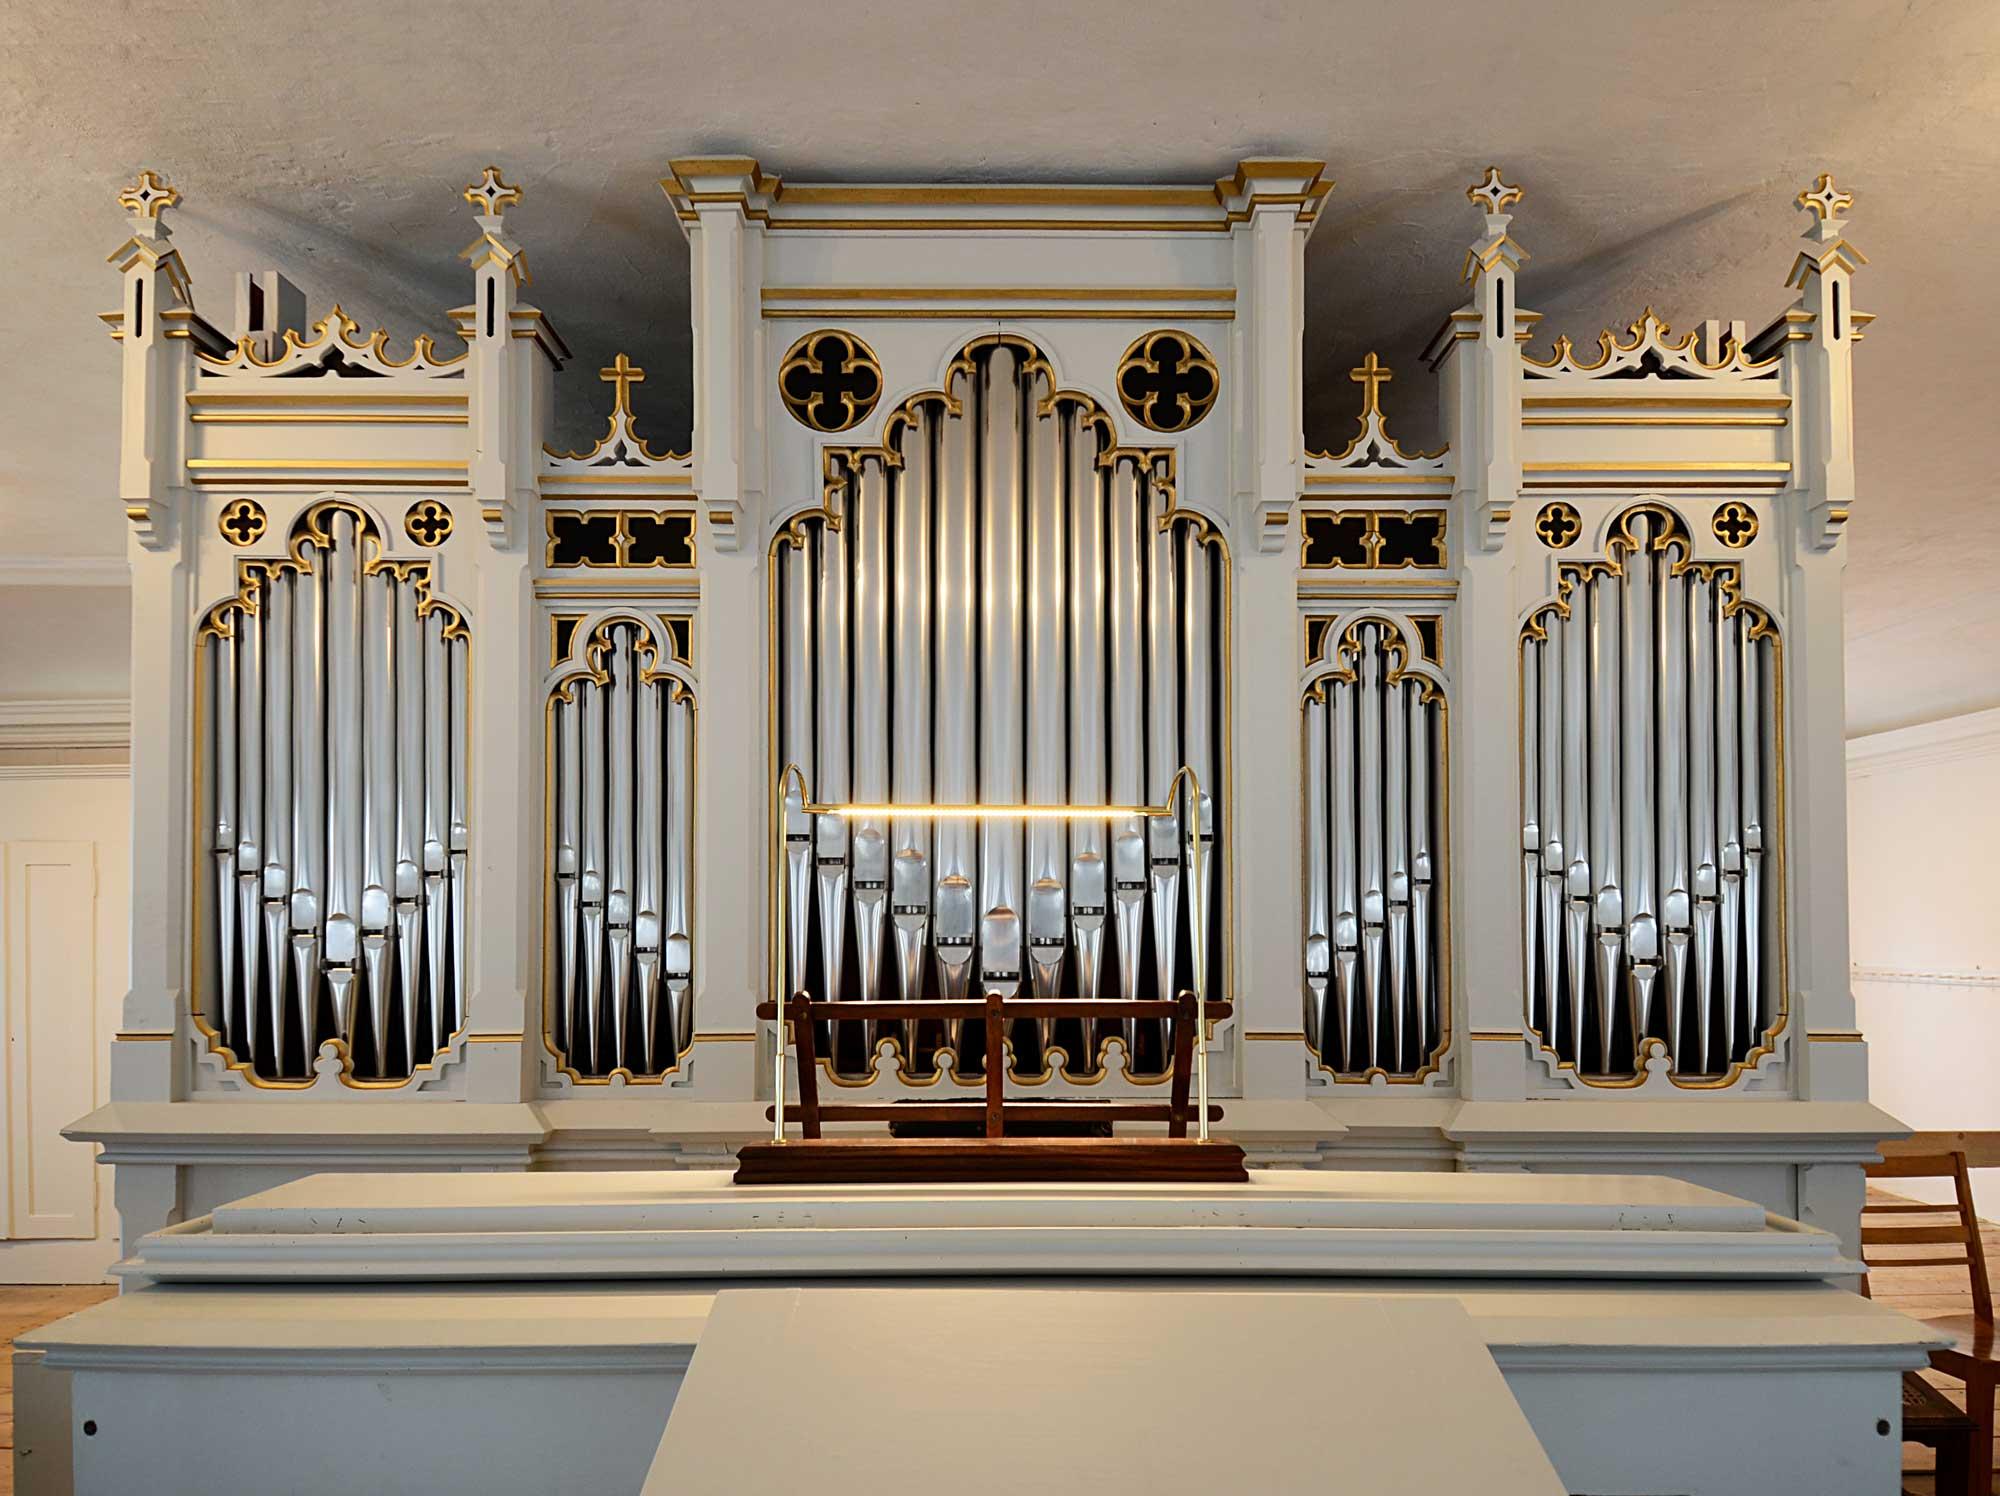 Brødremenighedens kirke · Christiansfeld